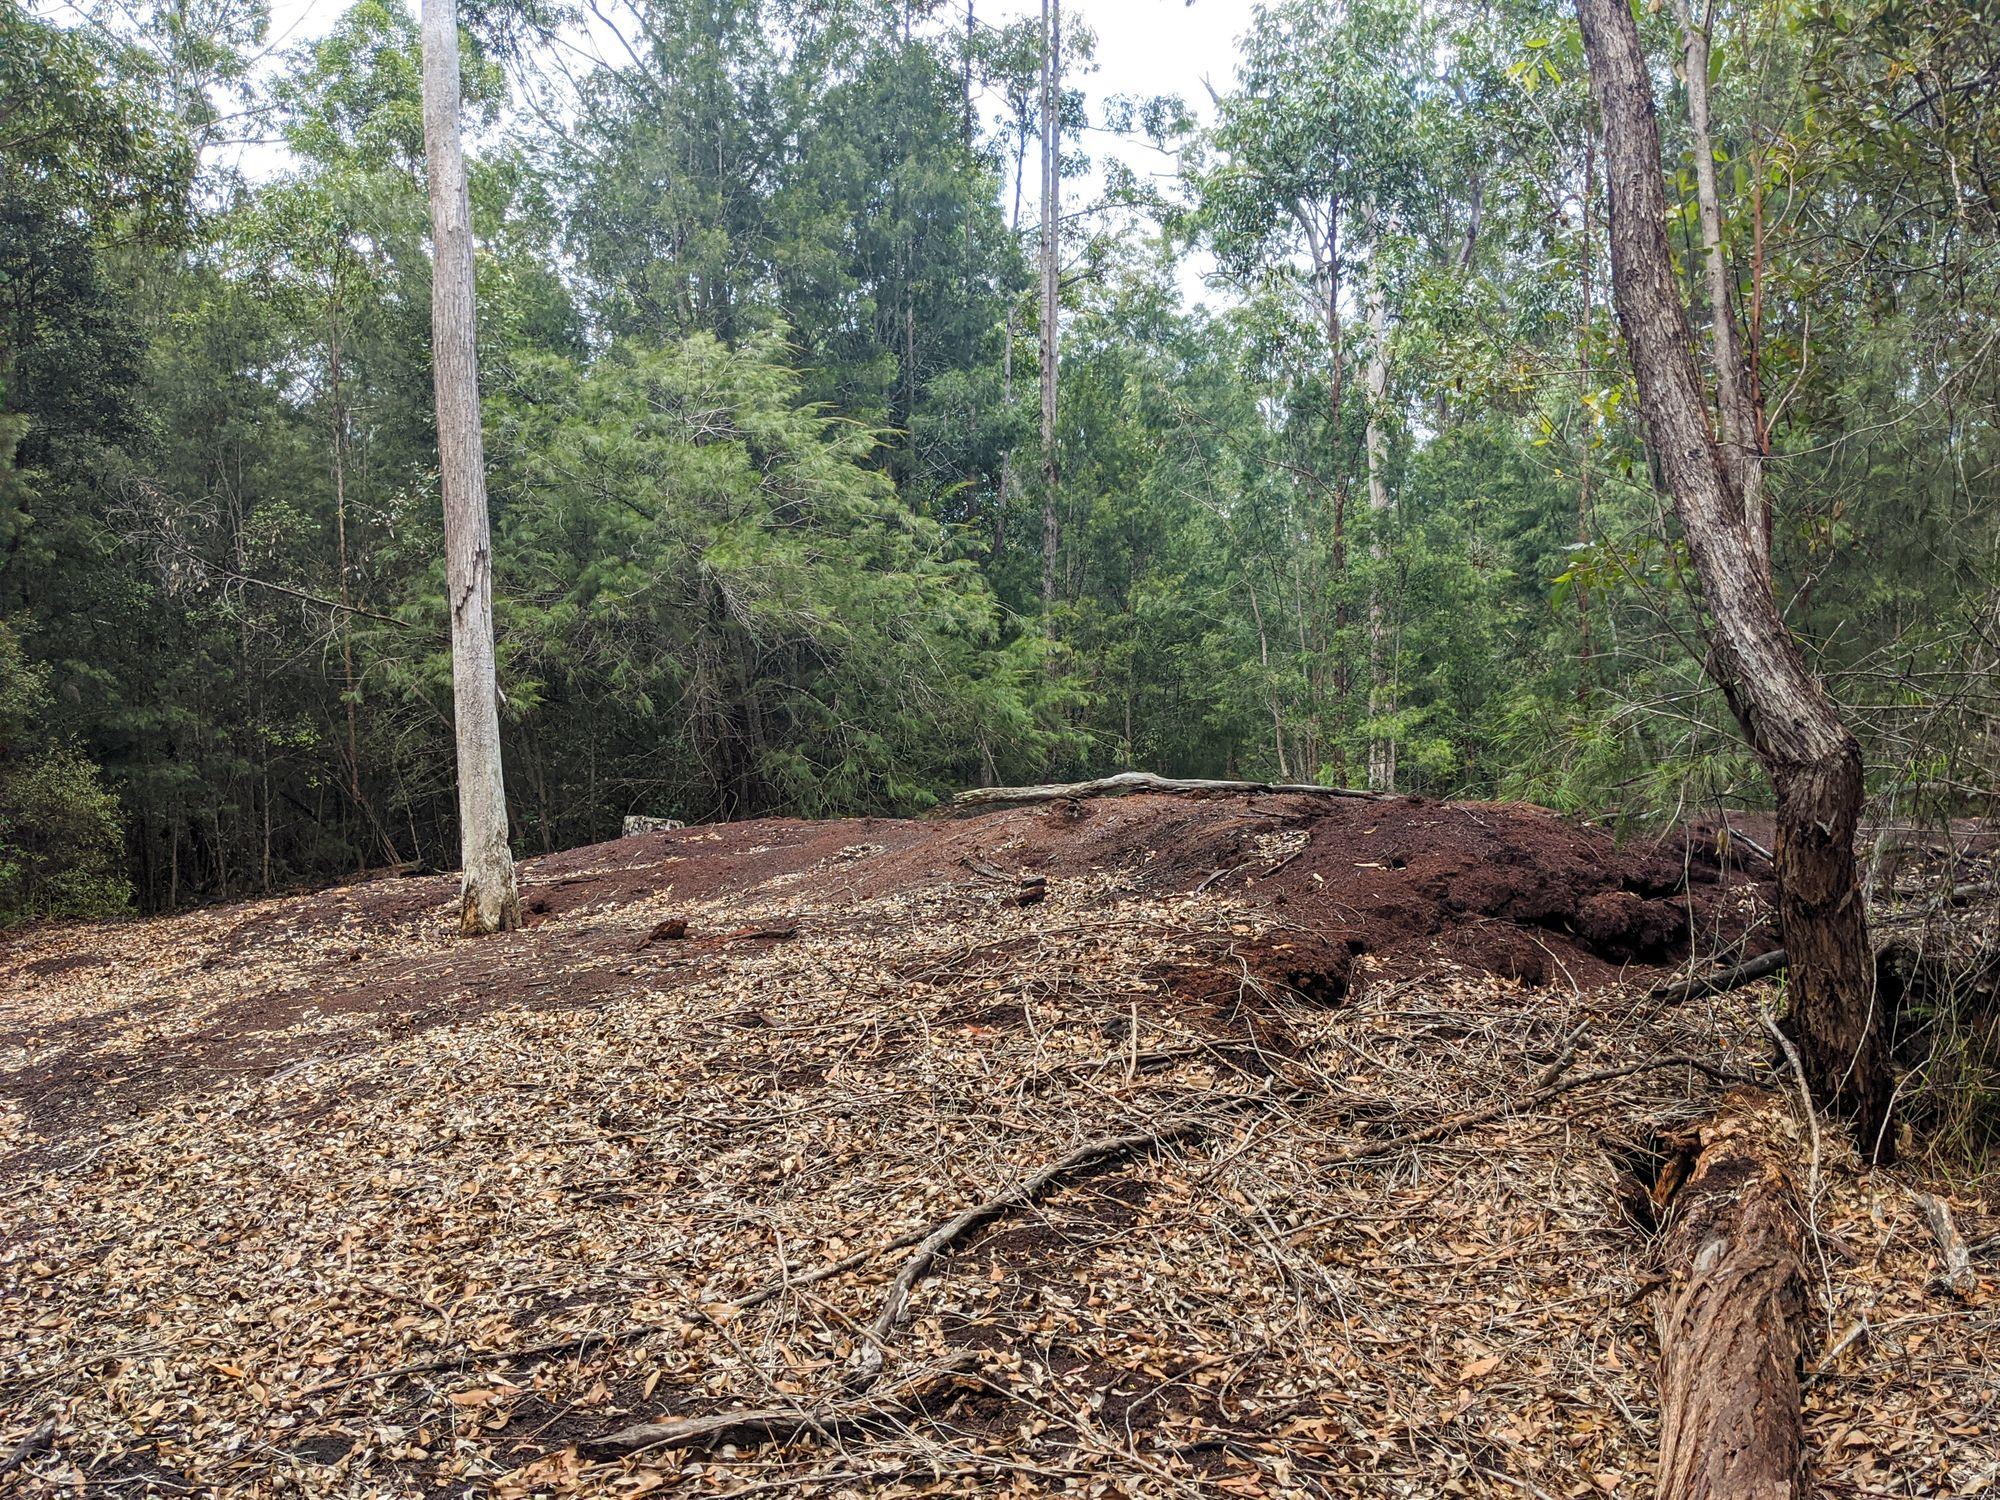 Paluma sawdust pile